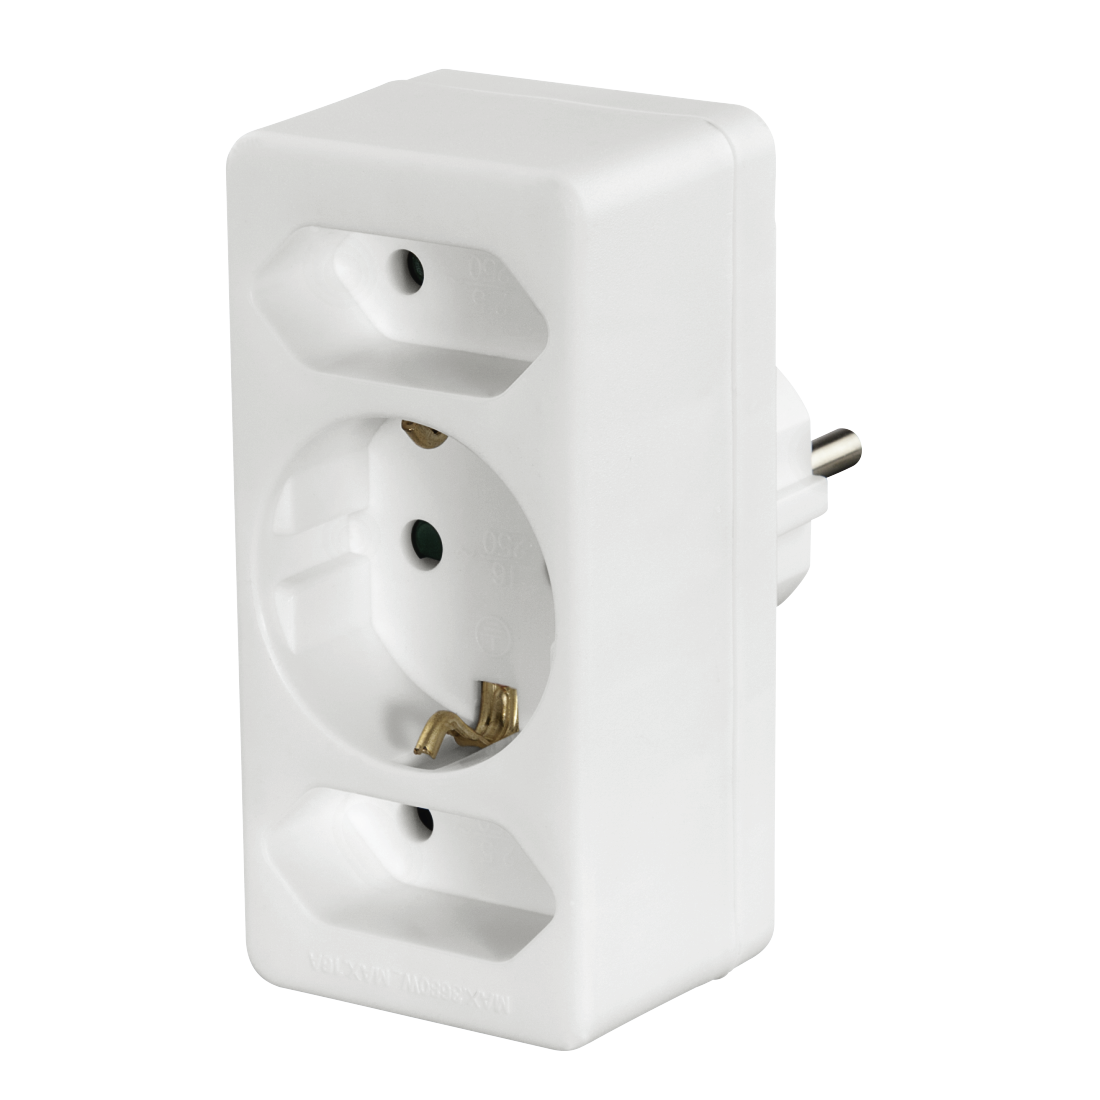 hama.com | 00108844 Hama 3-Way Multi-Plug, 2 Euro sockets/1 socket ...